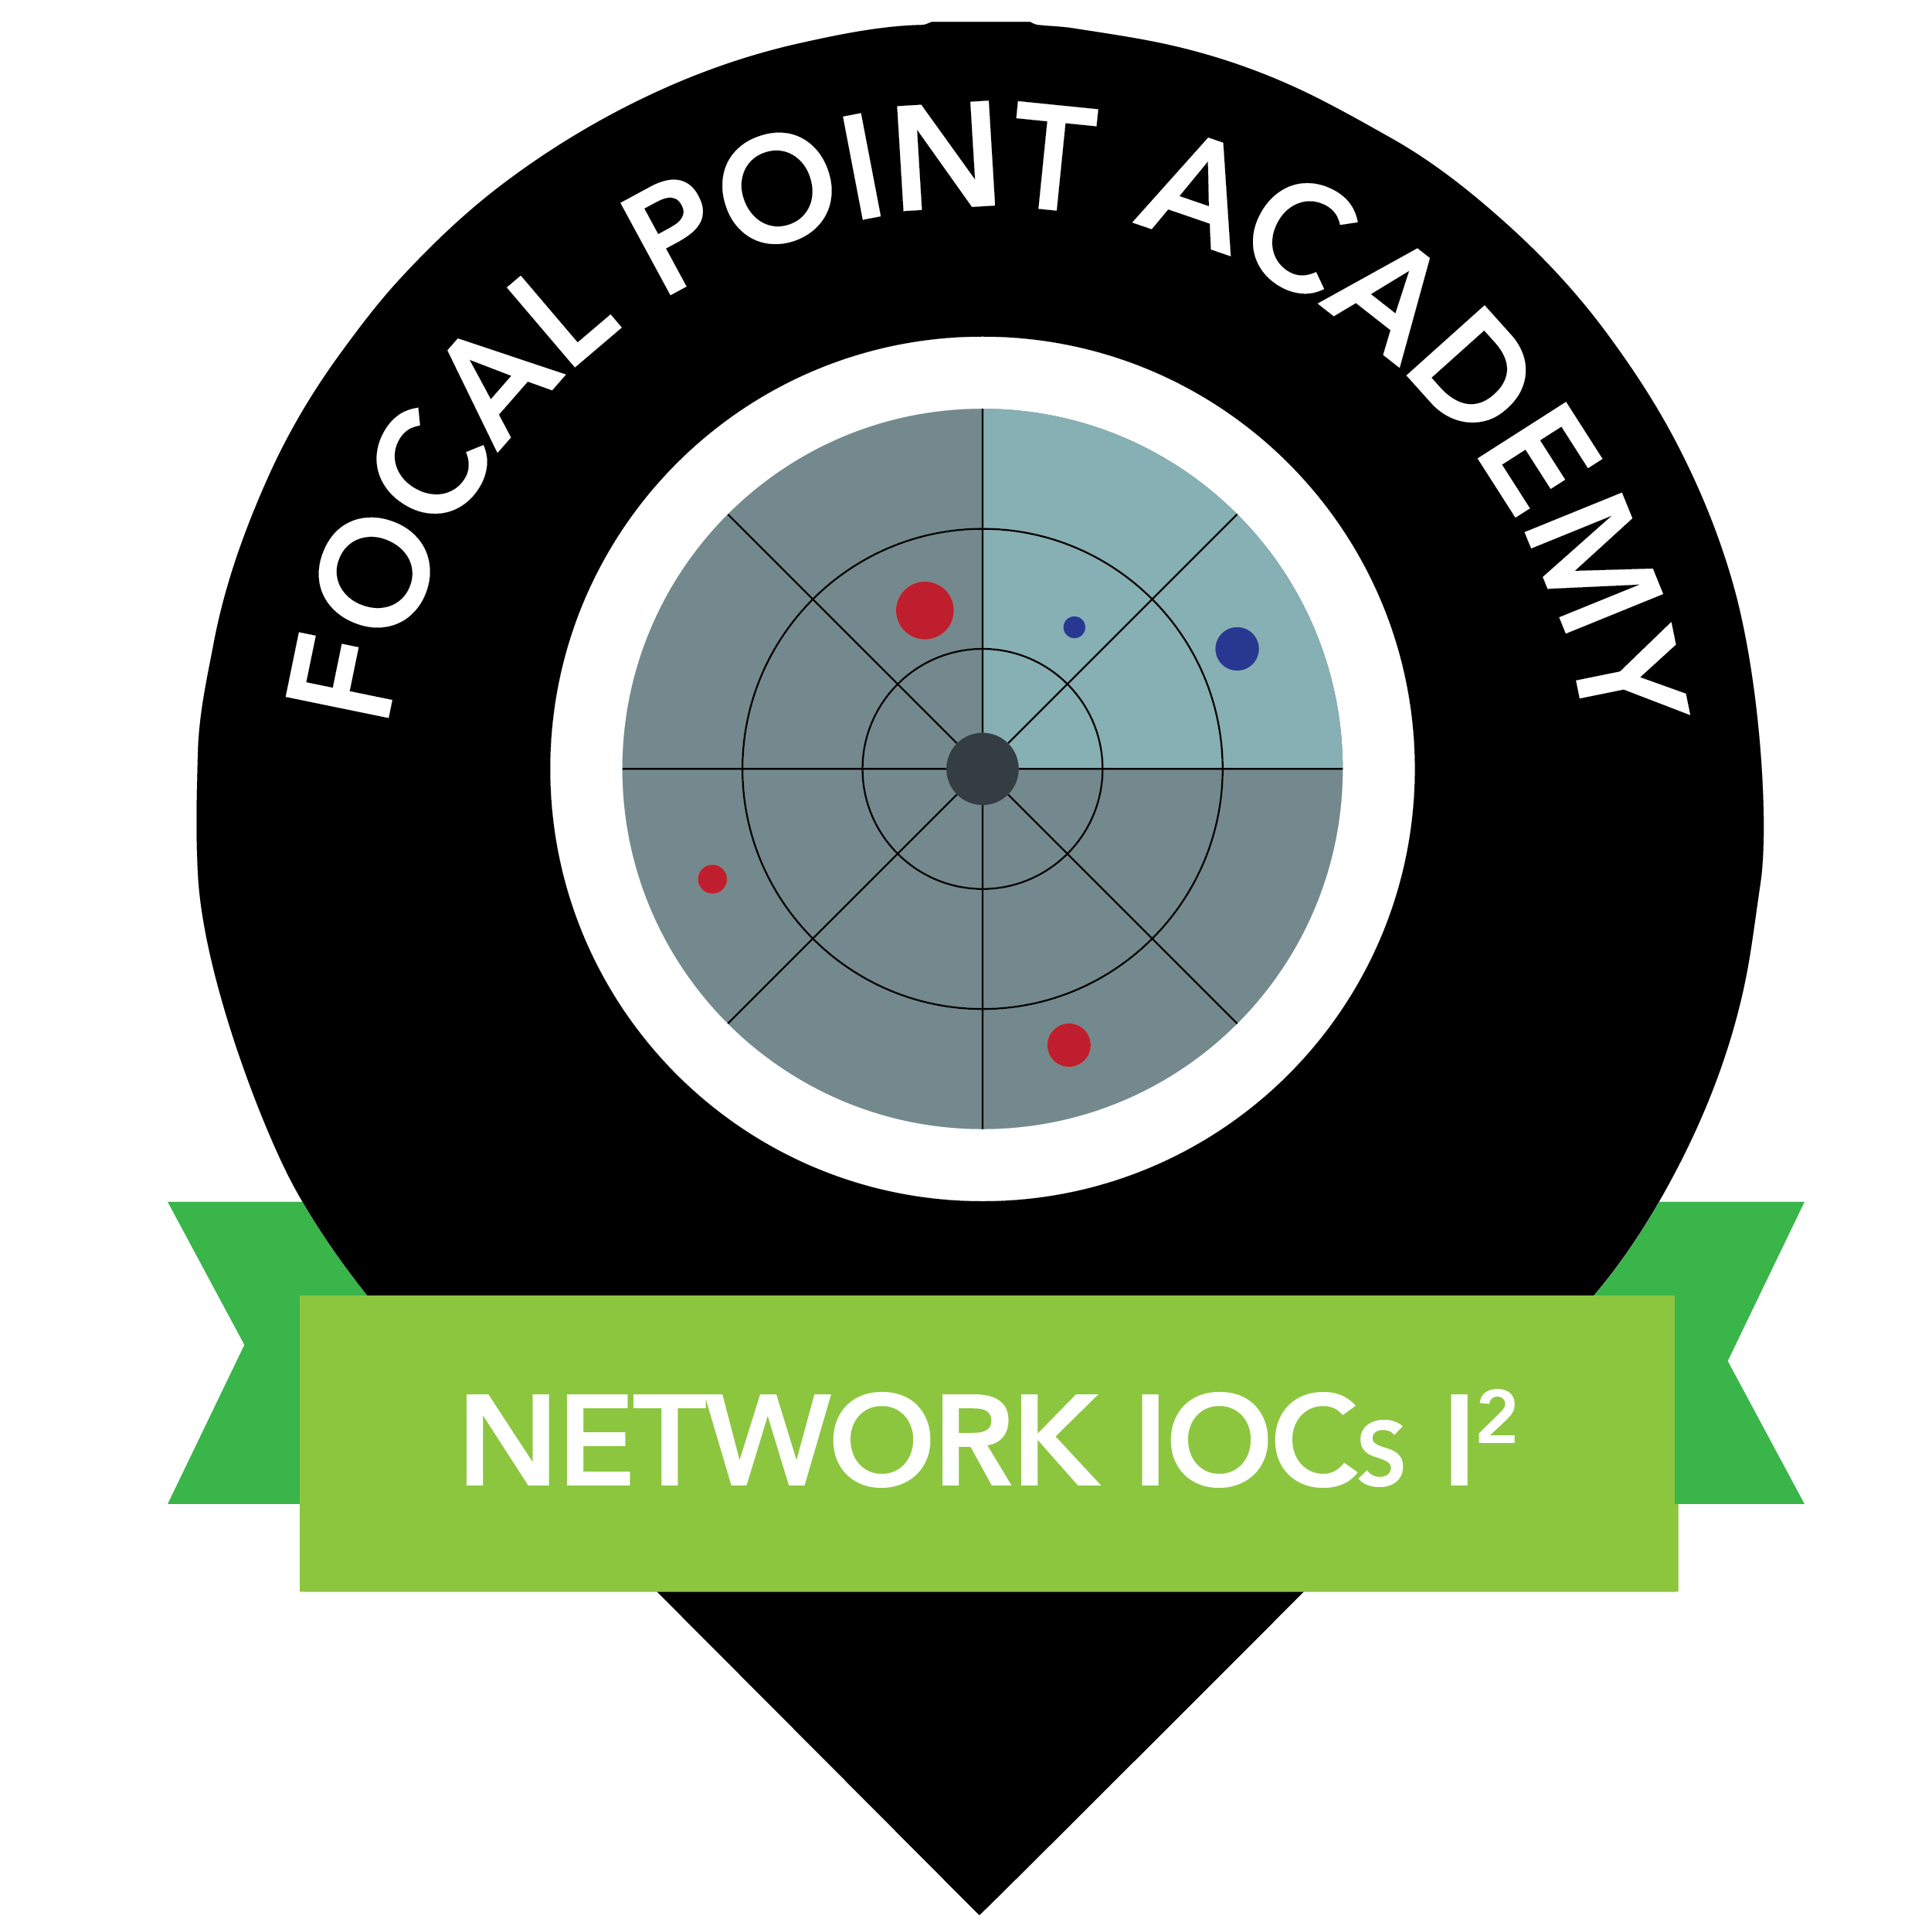 Network IOC Identification & Investigation